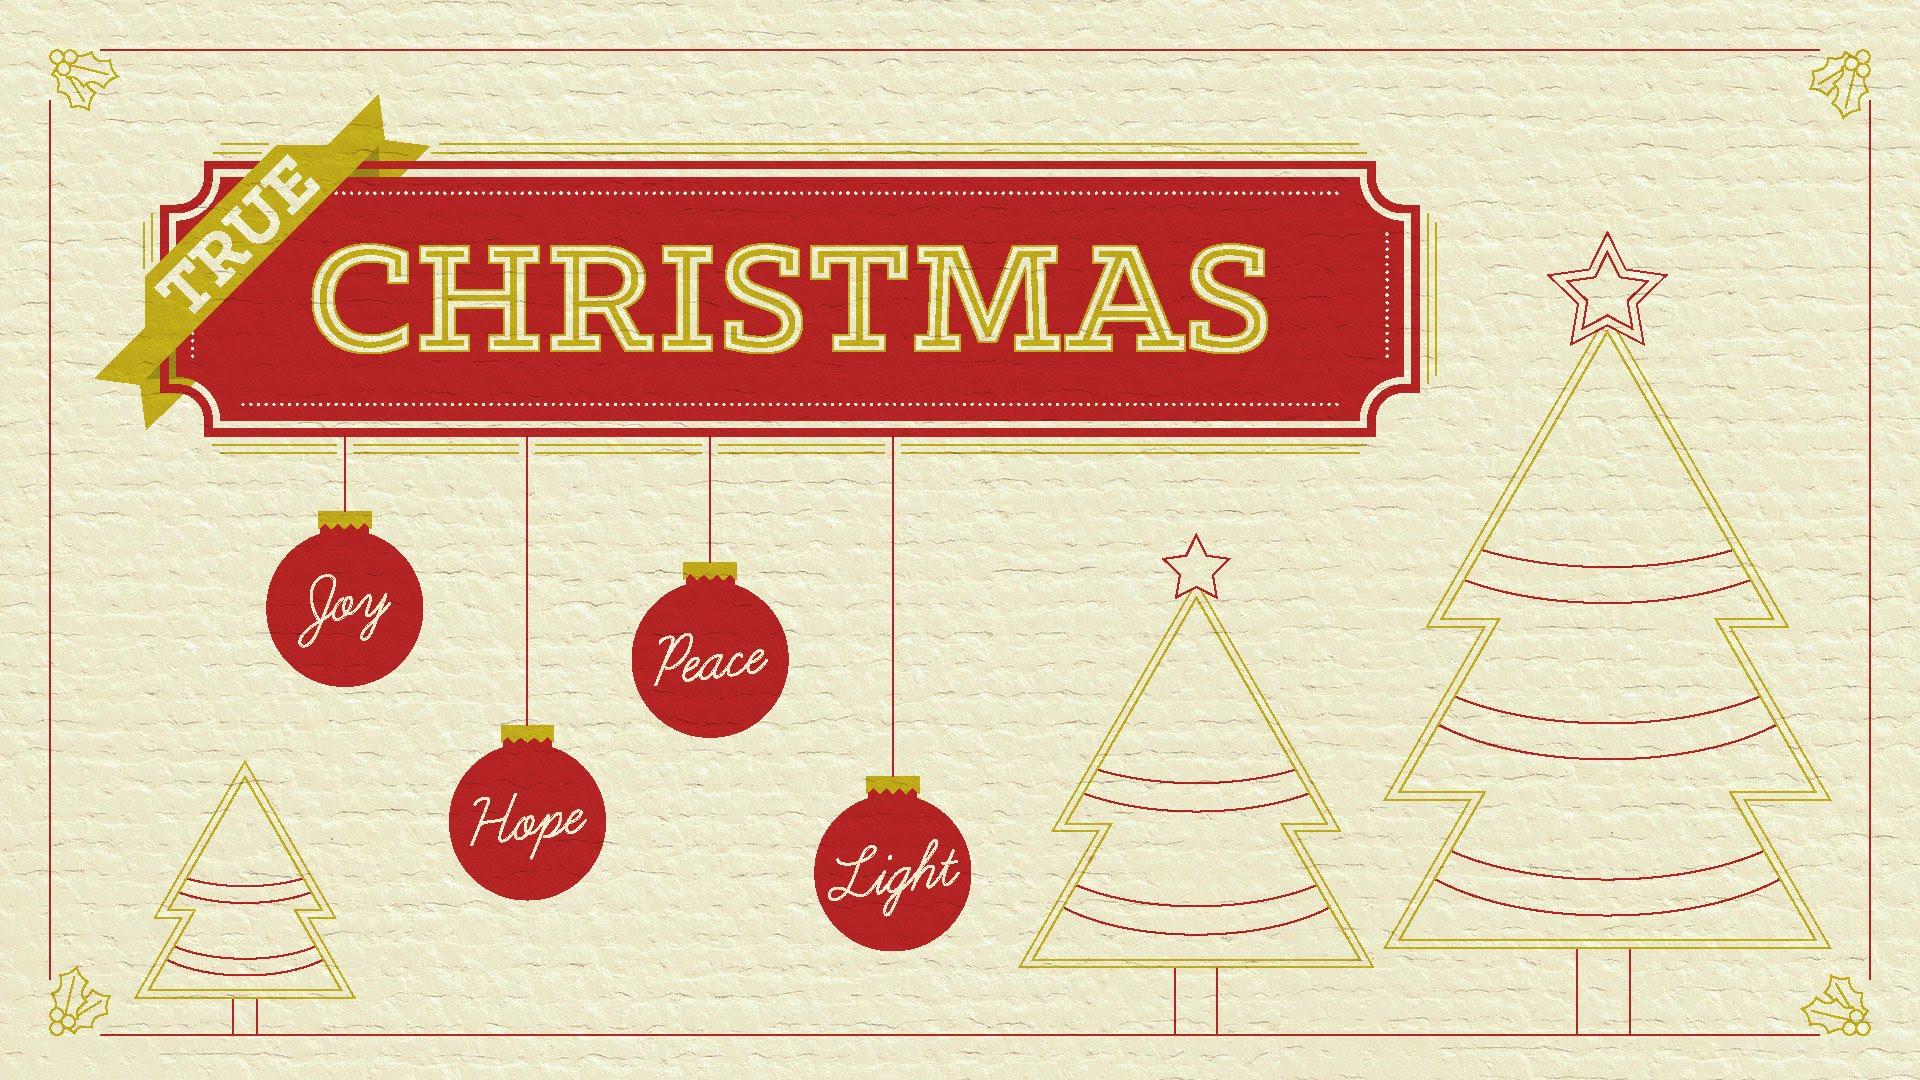 True Christmas: Peace